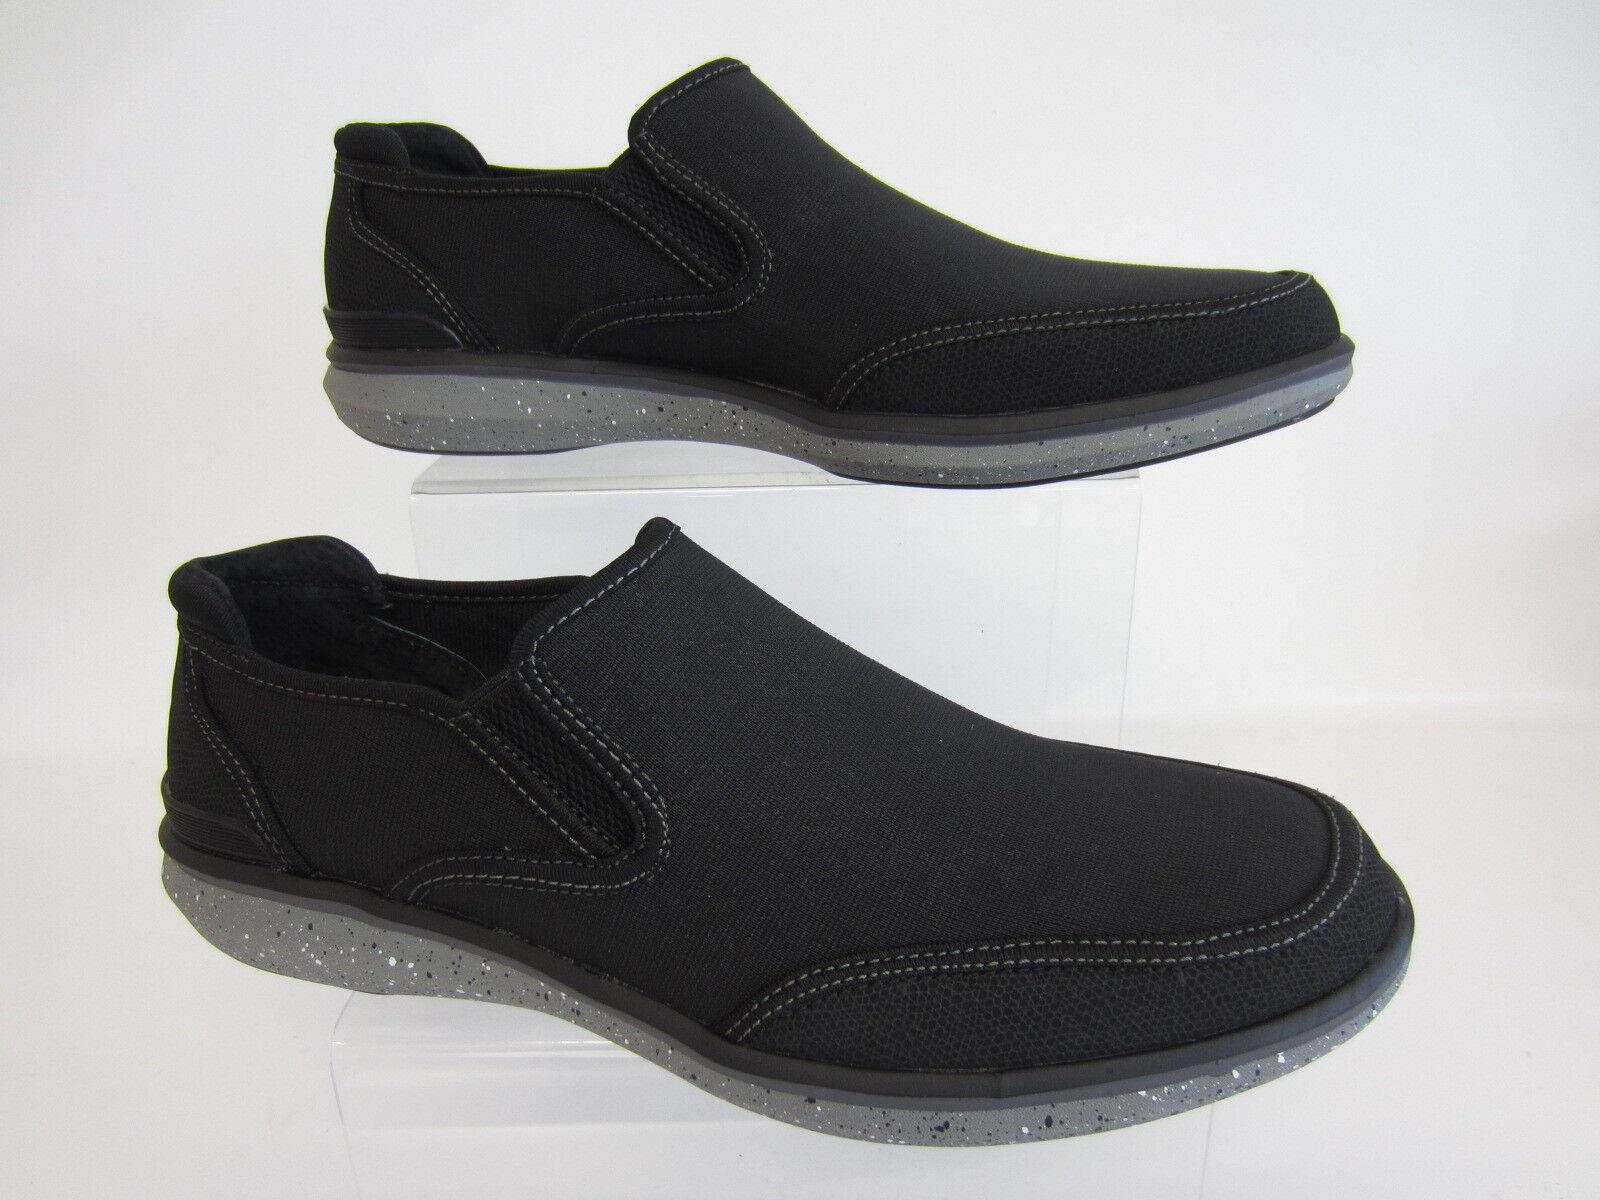 Mark Nason Helston 68130 Herren Freizeit Textil ohne Bügel Schwarze Schuhe UK 7/